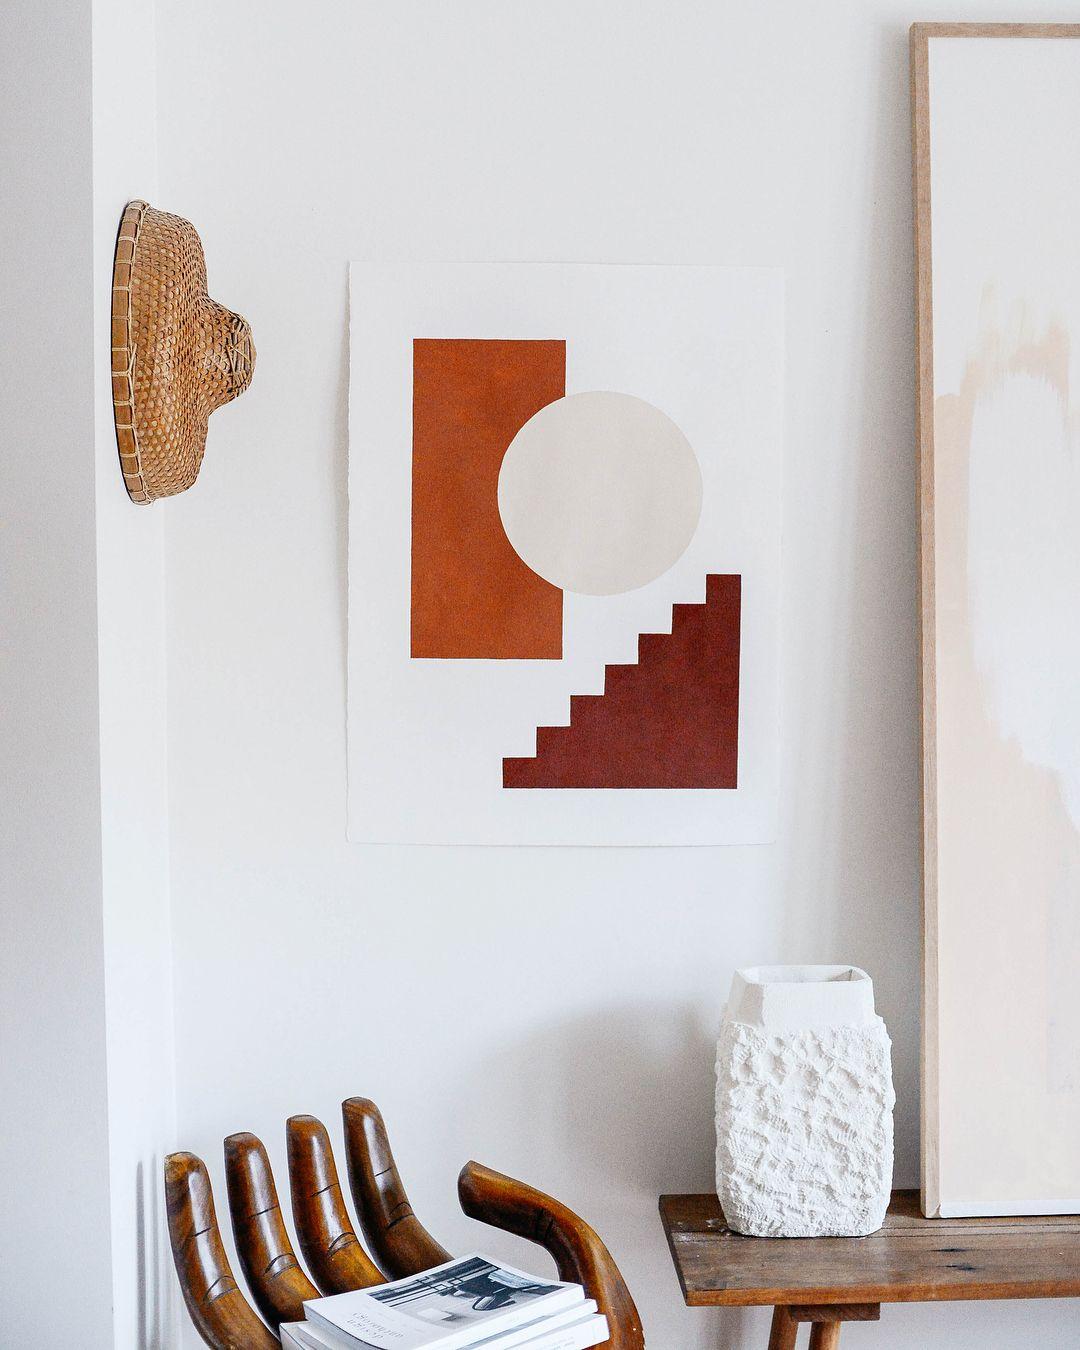 Eggshell paint mid century decor diy house projects interior design modern interior